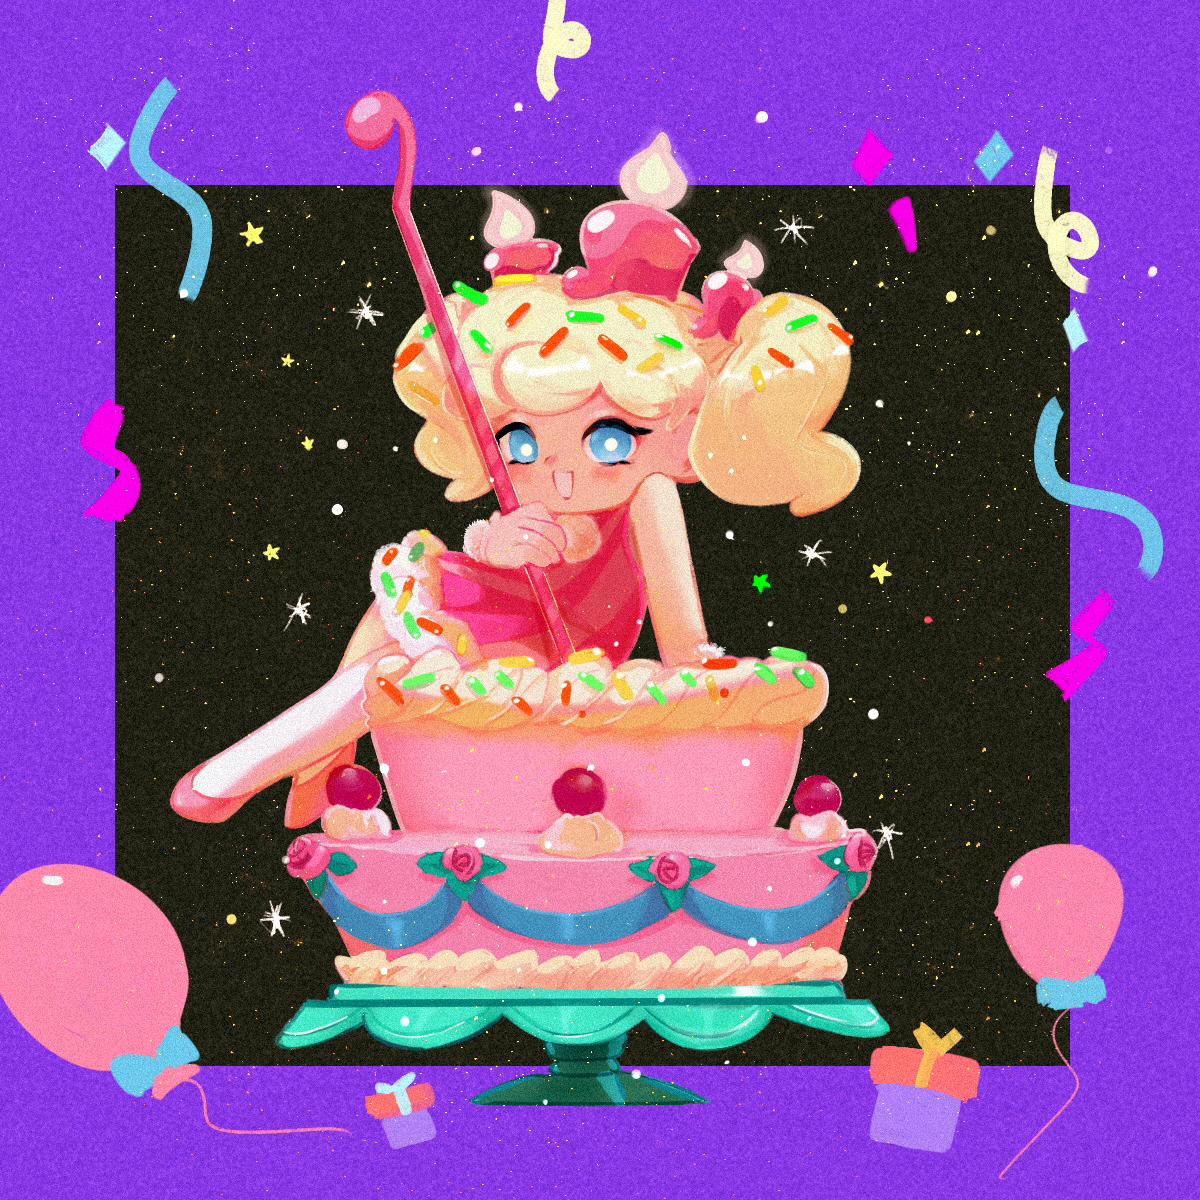 Wondrous Birthday Cake Cookie Cookie Run Ovenbreak Image 2747438 Funny Birthday Cards Online Unhofree Goldxyz